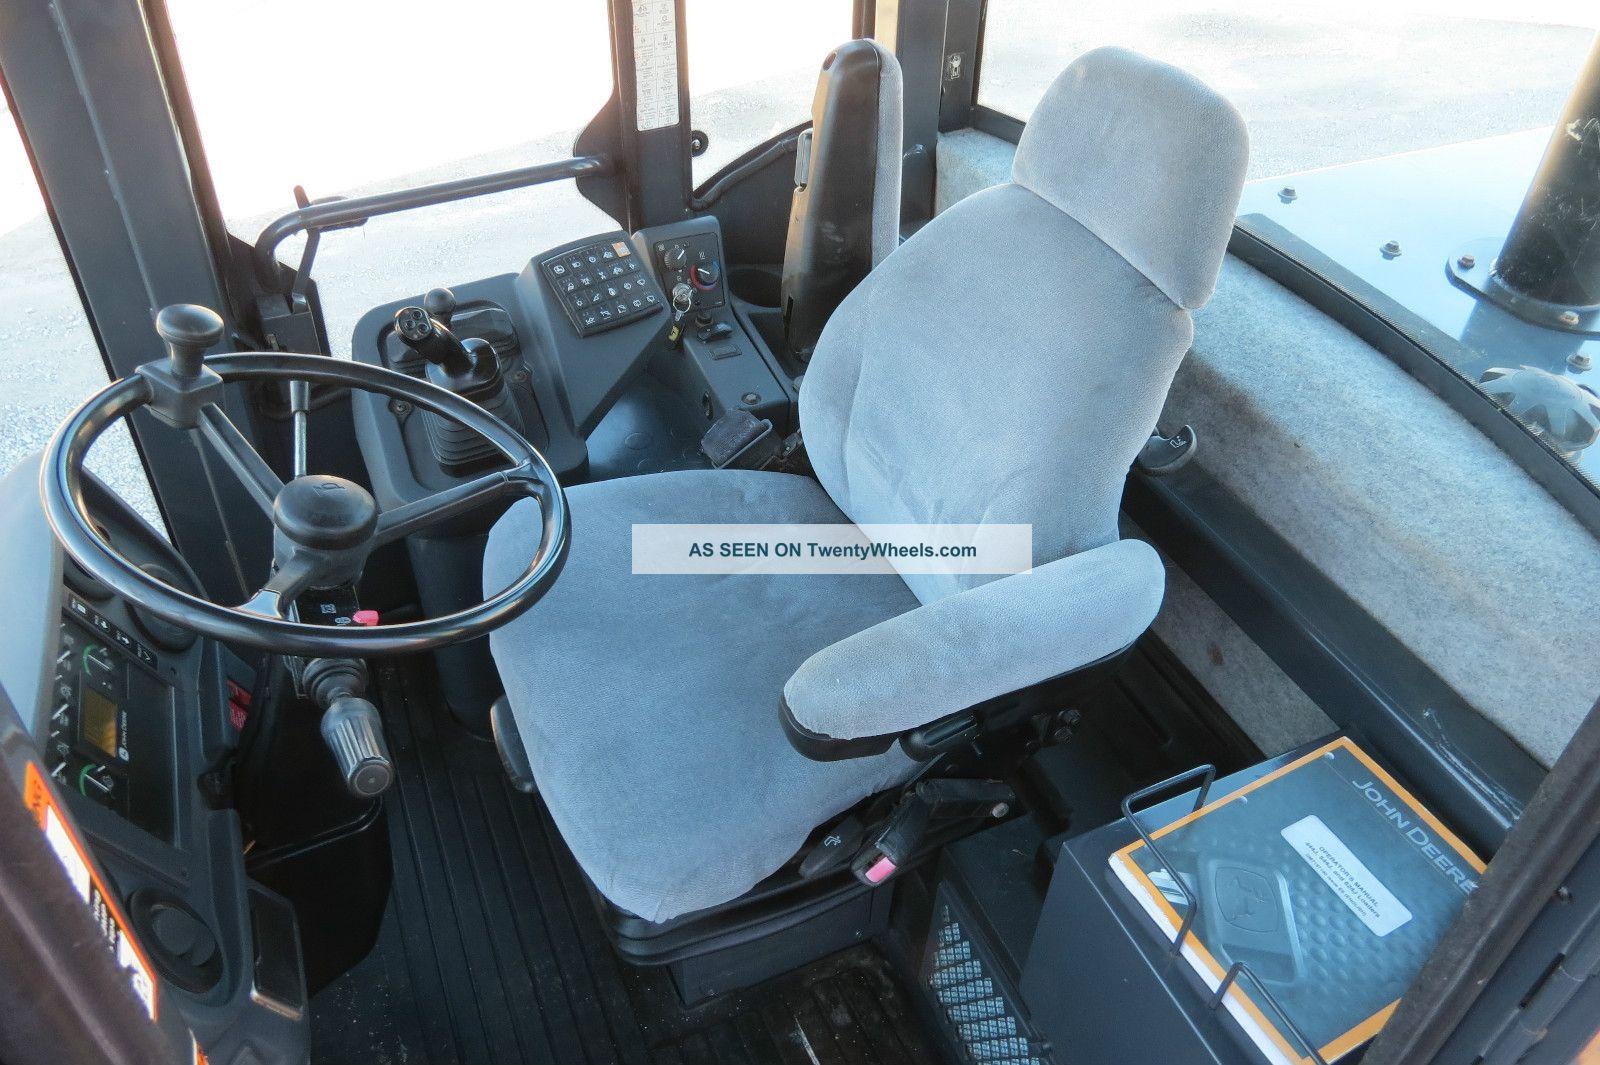 John Deere Jd 544j Wheel Loader 544 Cab A C Quick Coupler